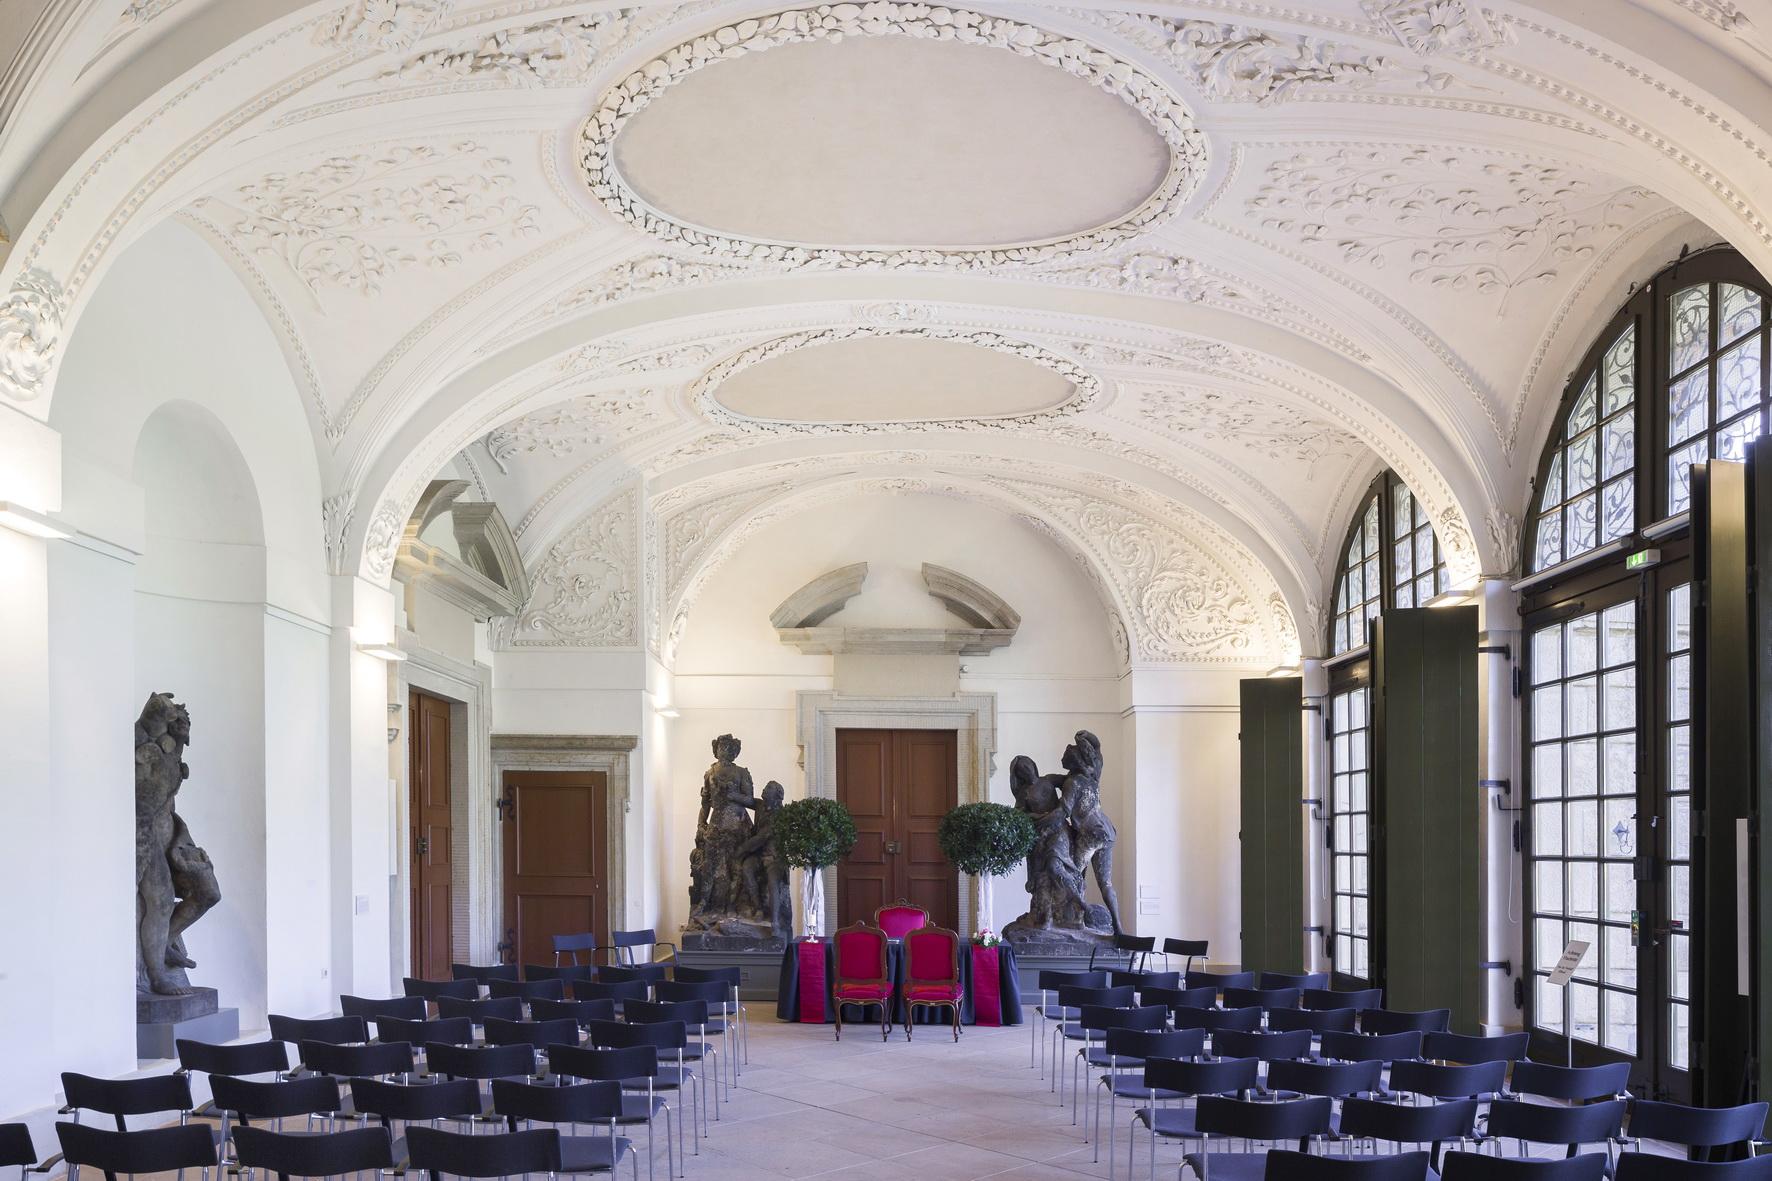 Heiraten Im Palais Des Grossen Gartens Landeshauptstadt Dresden